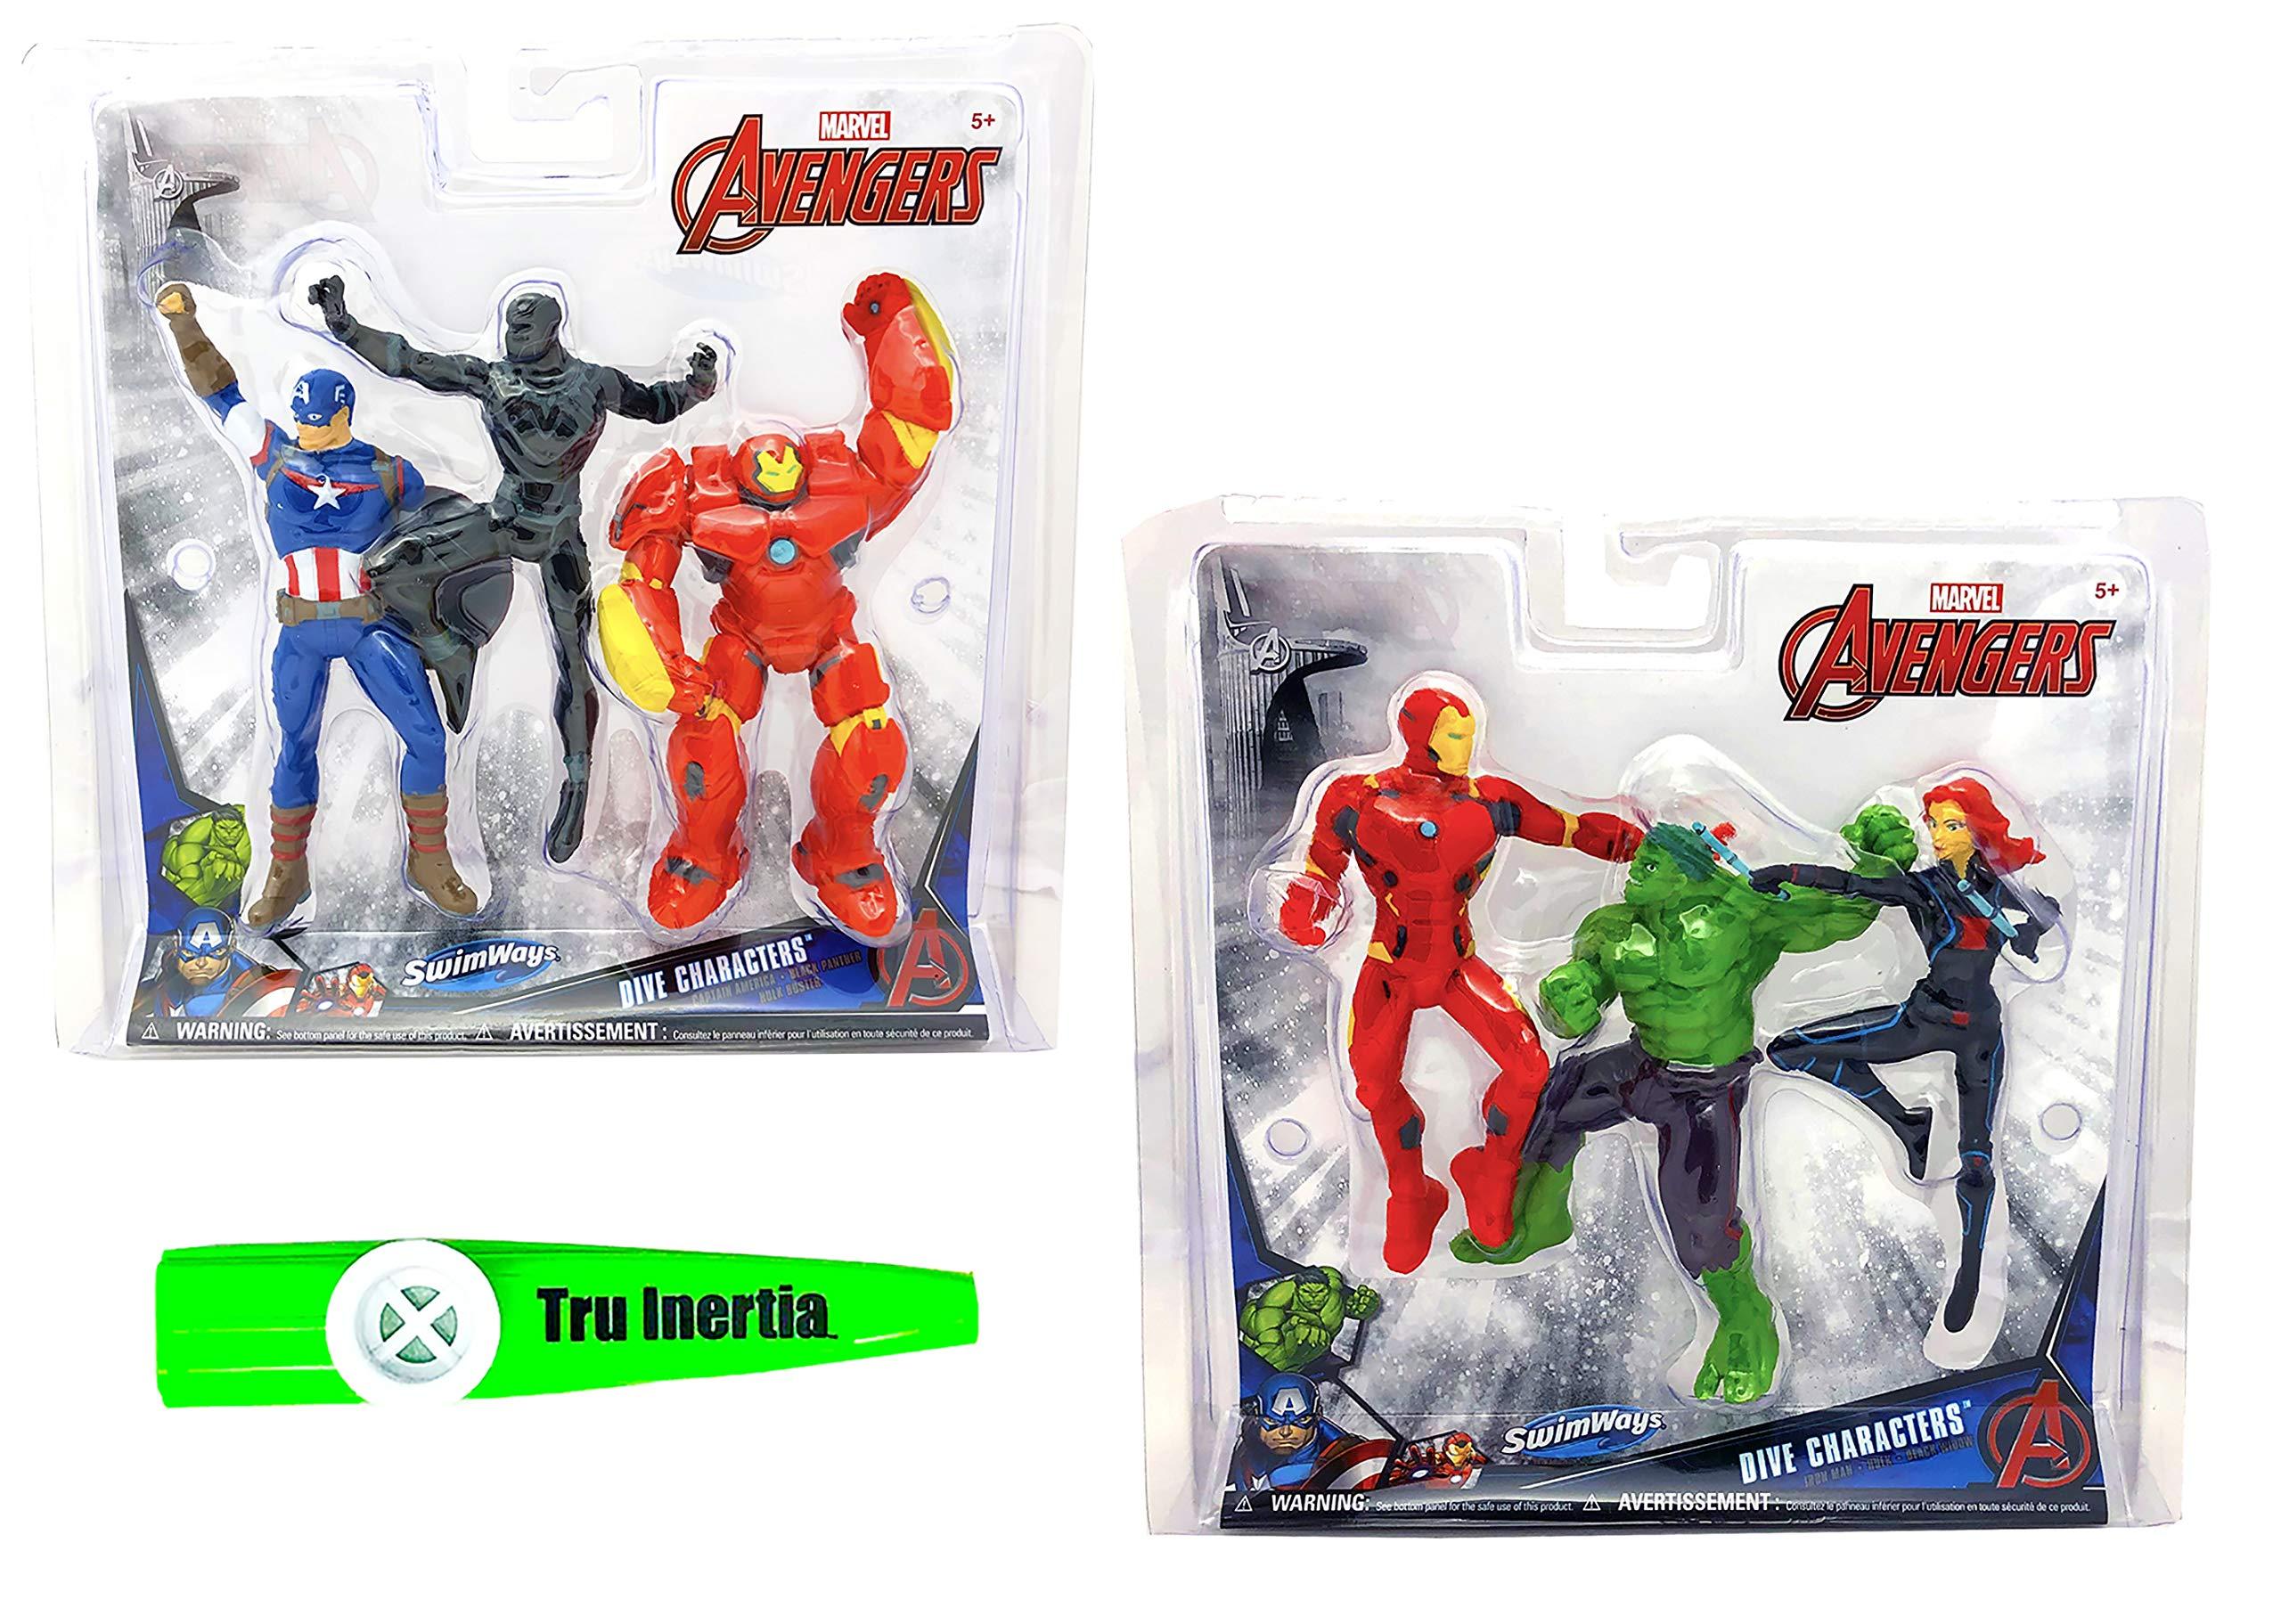 Tru Inertia Swimming Pool Dive Sticks Marvel Avengers End Game Characters Pool Toys Pack of 2 Kazoo (6 Dive Sticks Total) by Tru Inertia